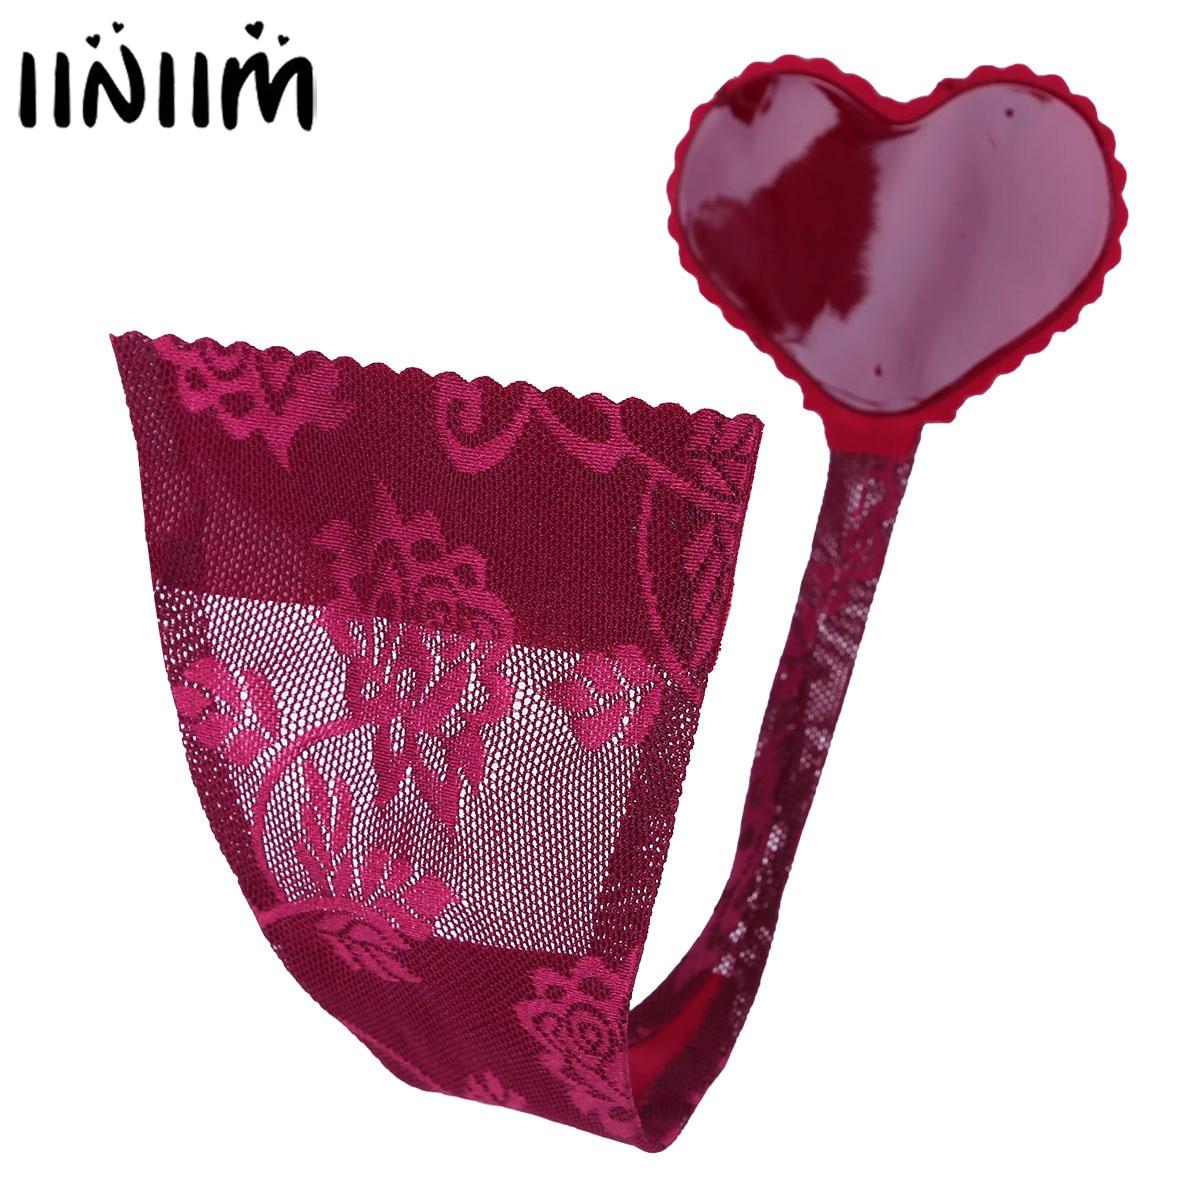 Mini tangas invisibles exóticas de estilo C para mujeres y adultos, sin Panty, ropa interior autoadhesiva, bragas sin tirantes, Tanga Sexy, lencería